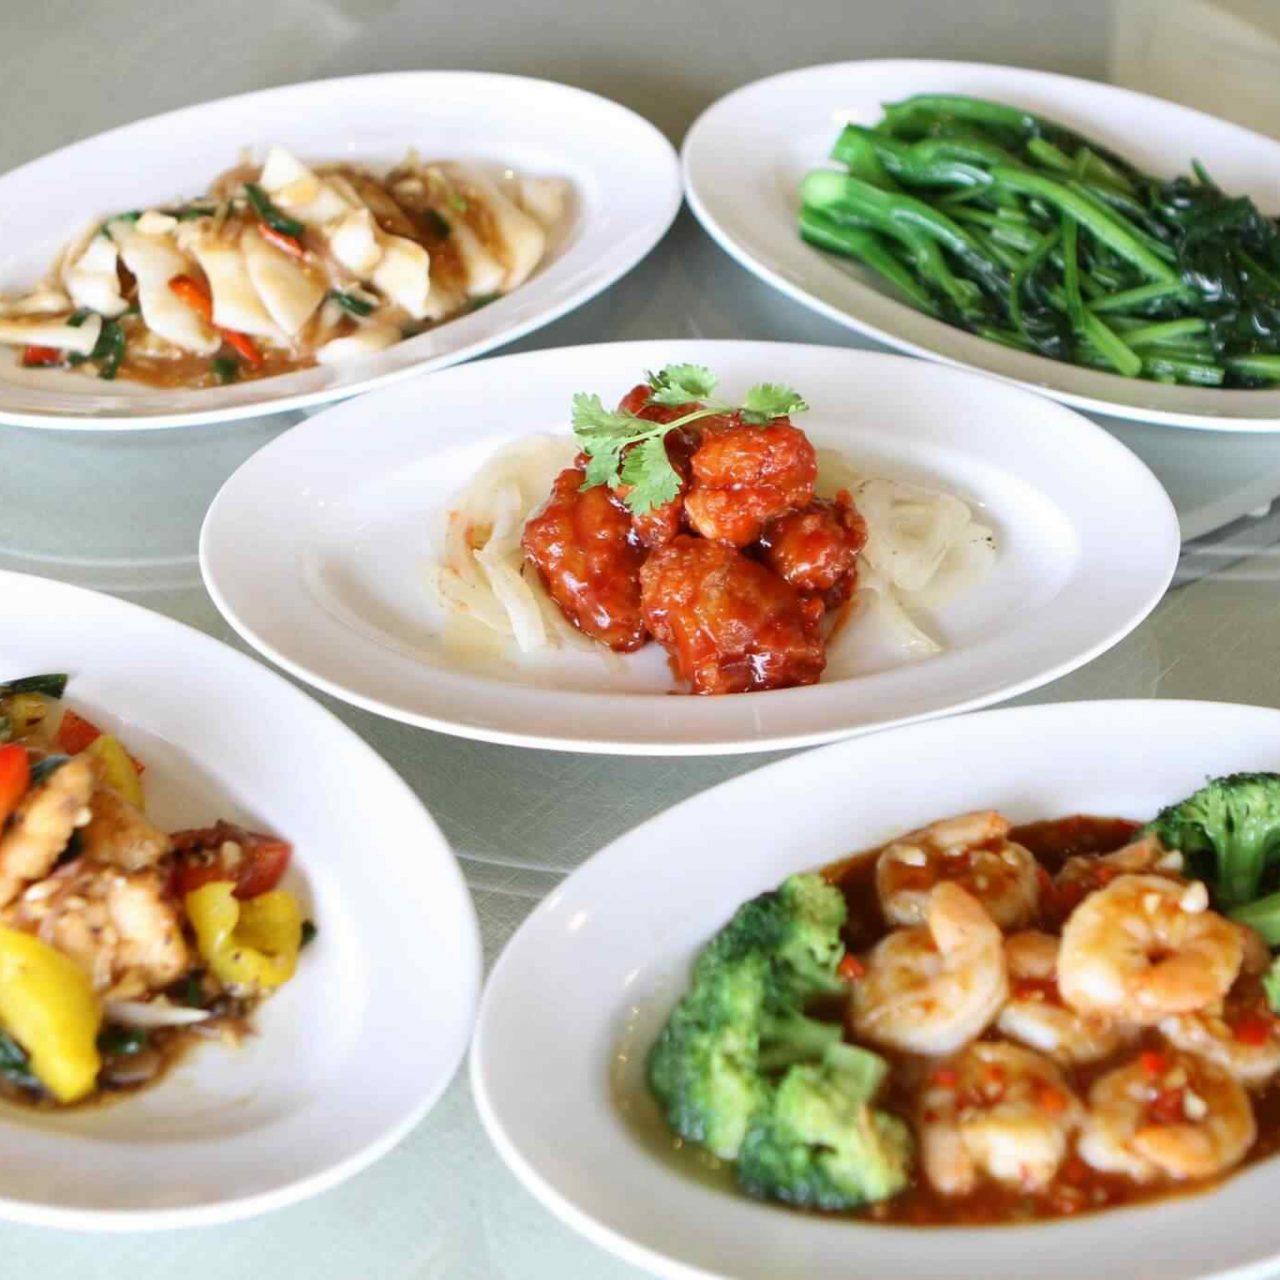 https://menudownloads.com/wp-content/uploads/2017/10/restaurant-chinese-4-1280x1280.jpg